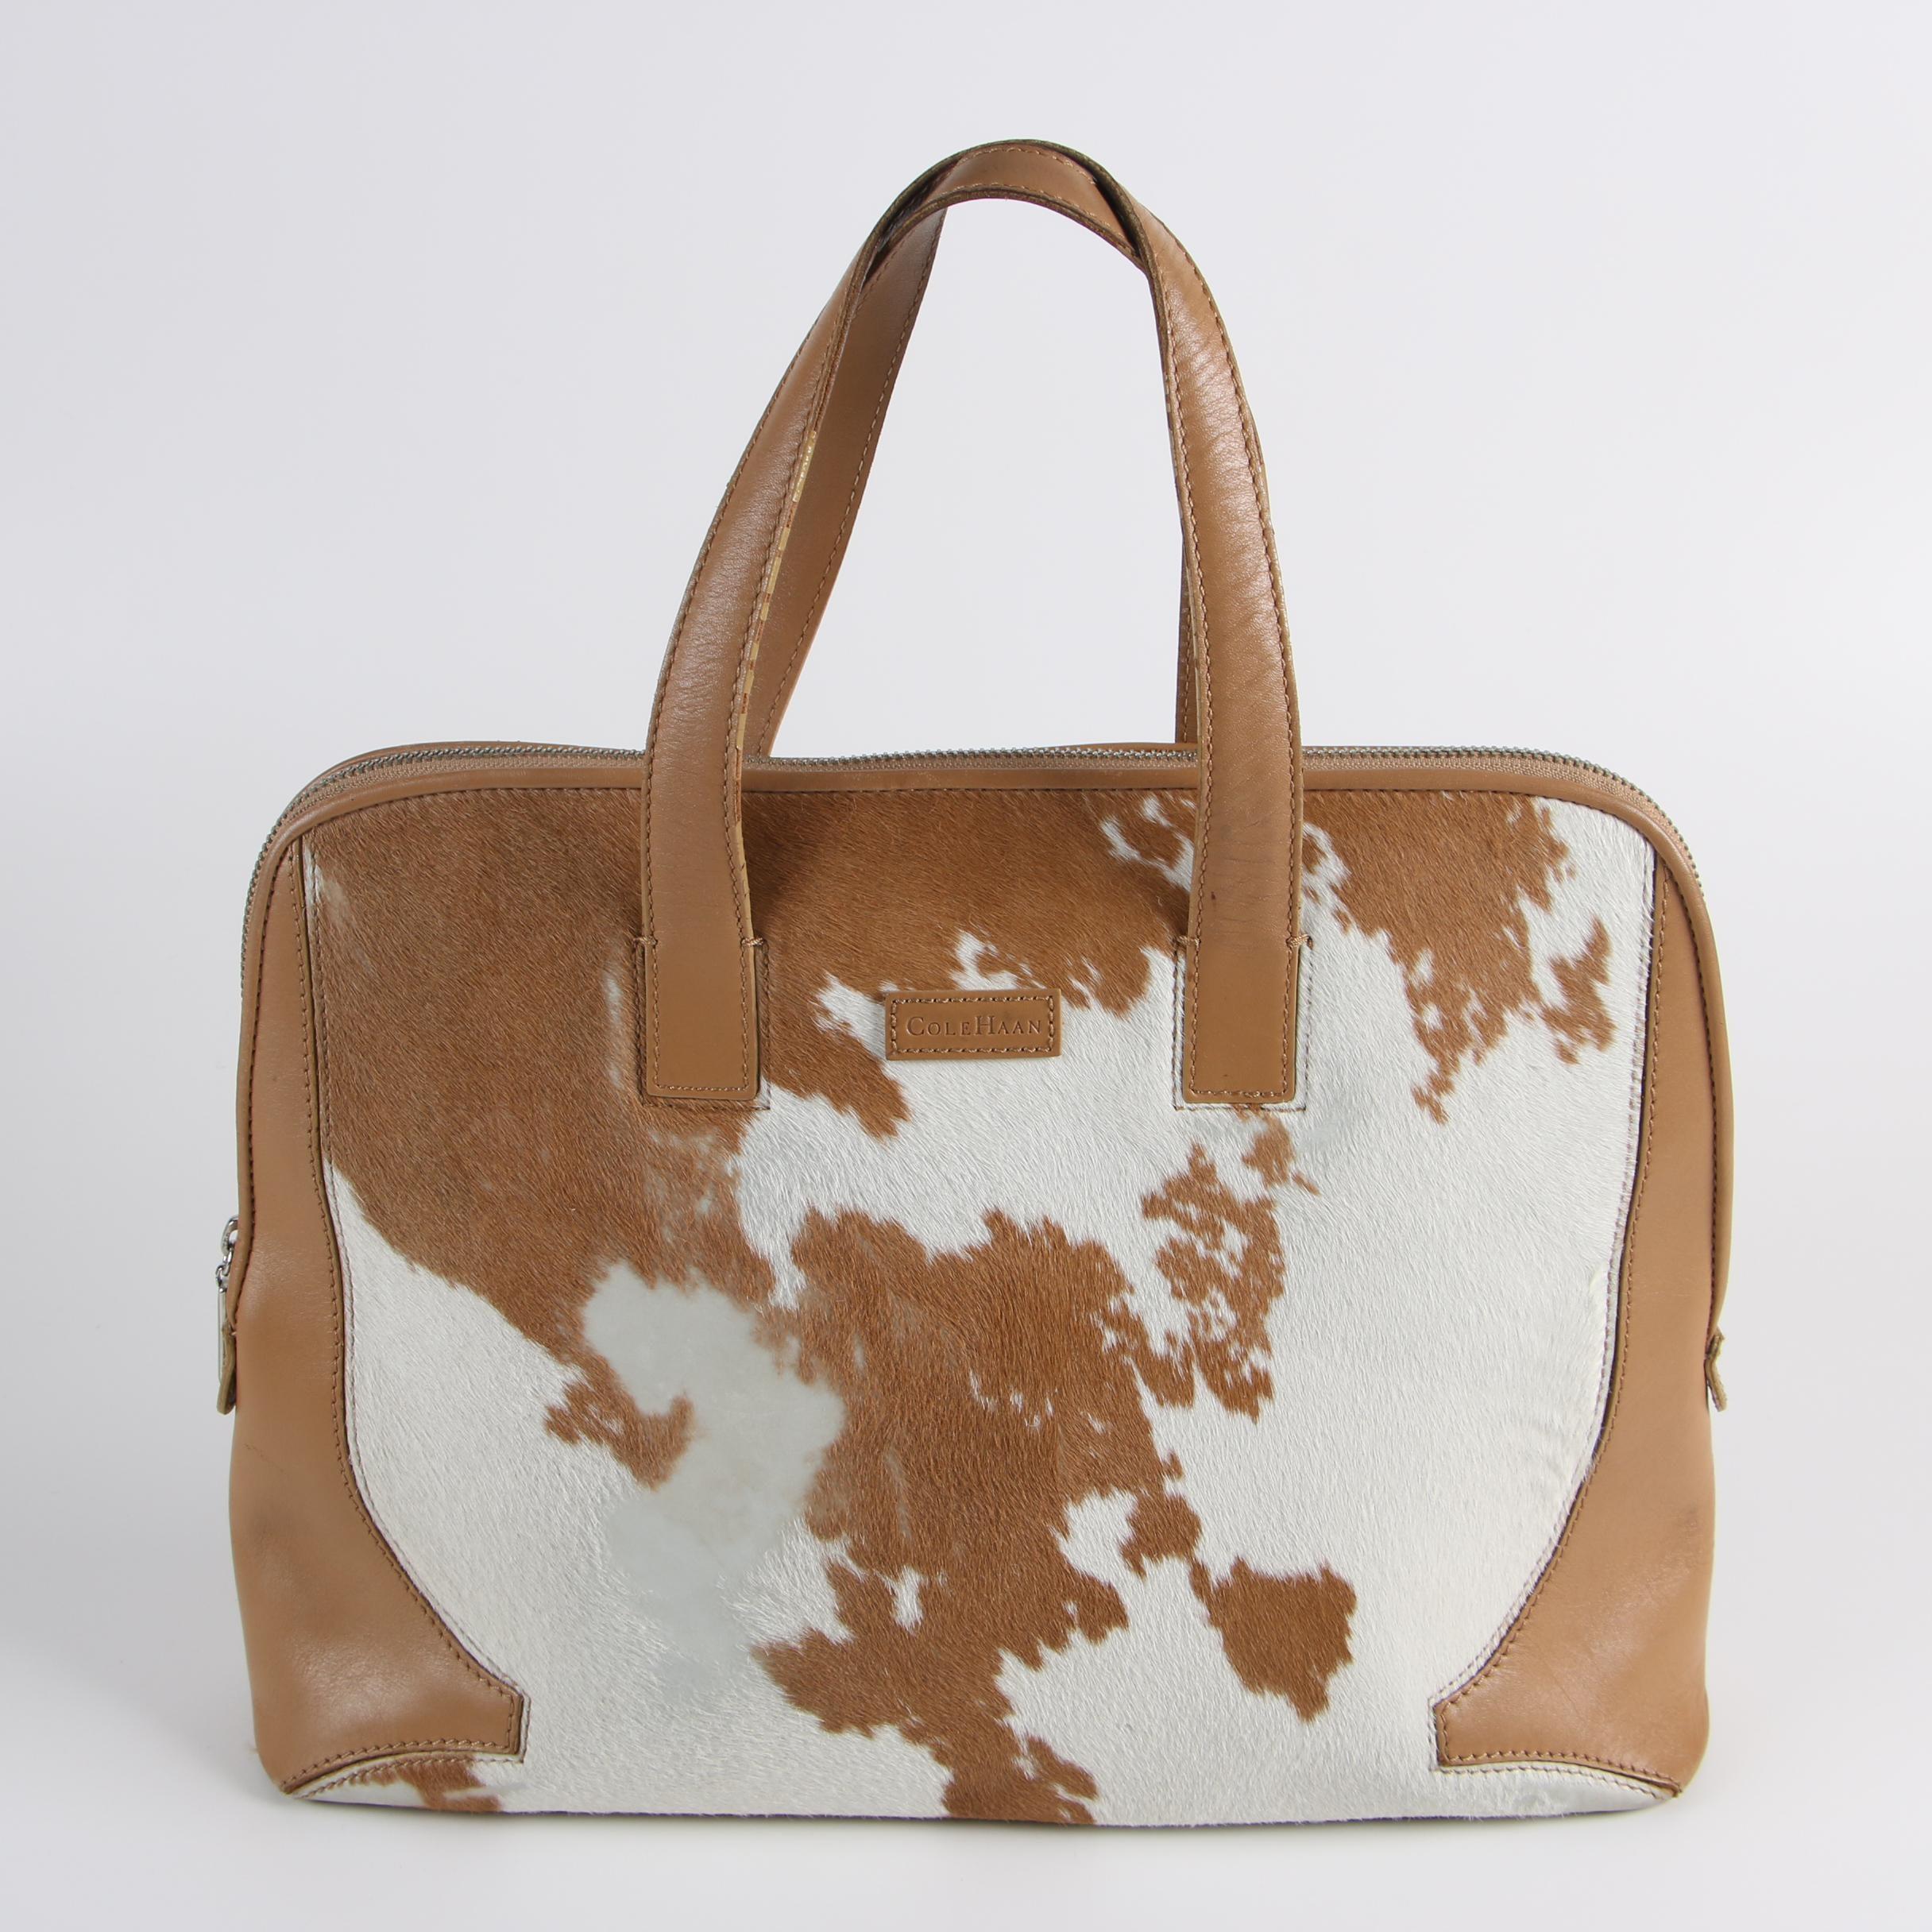 Cole Haan Calf Hair Leather Top Handle Bag